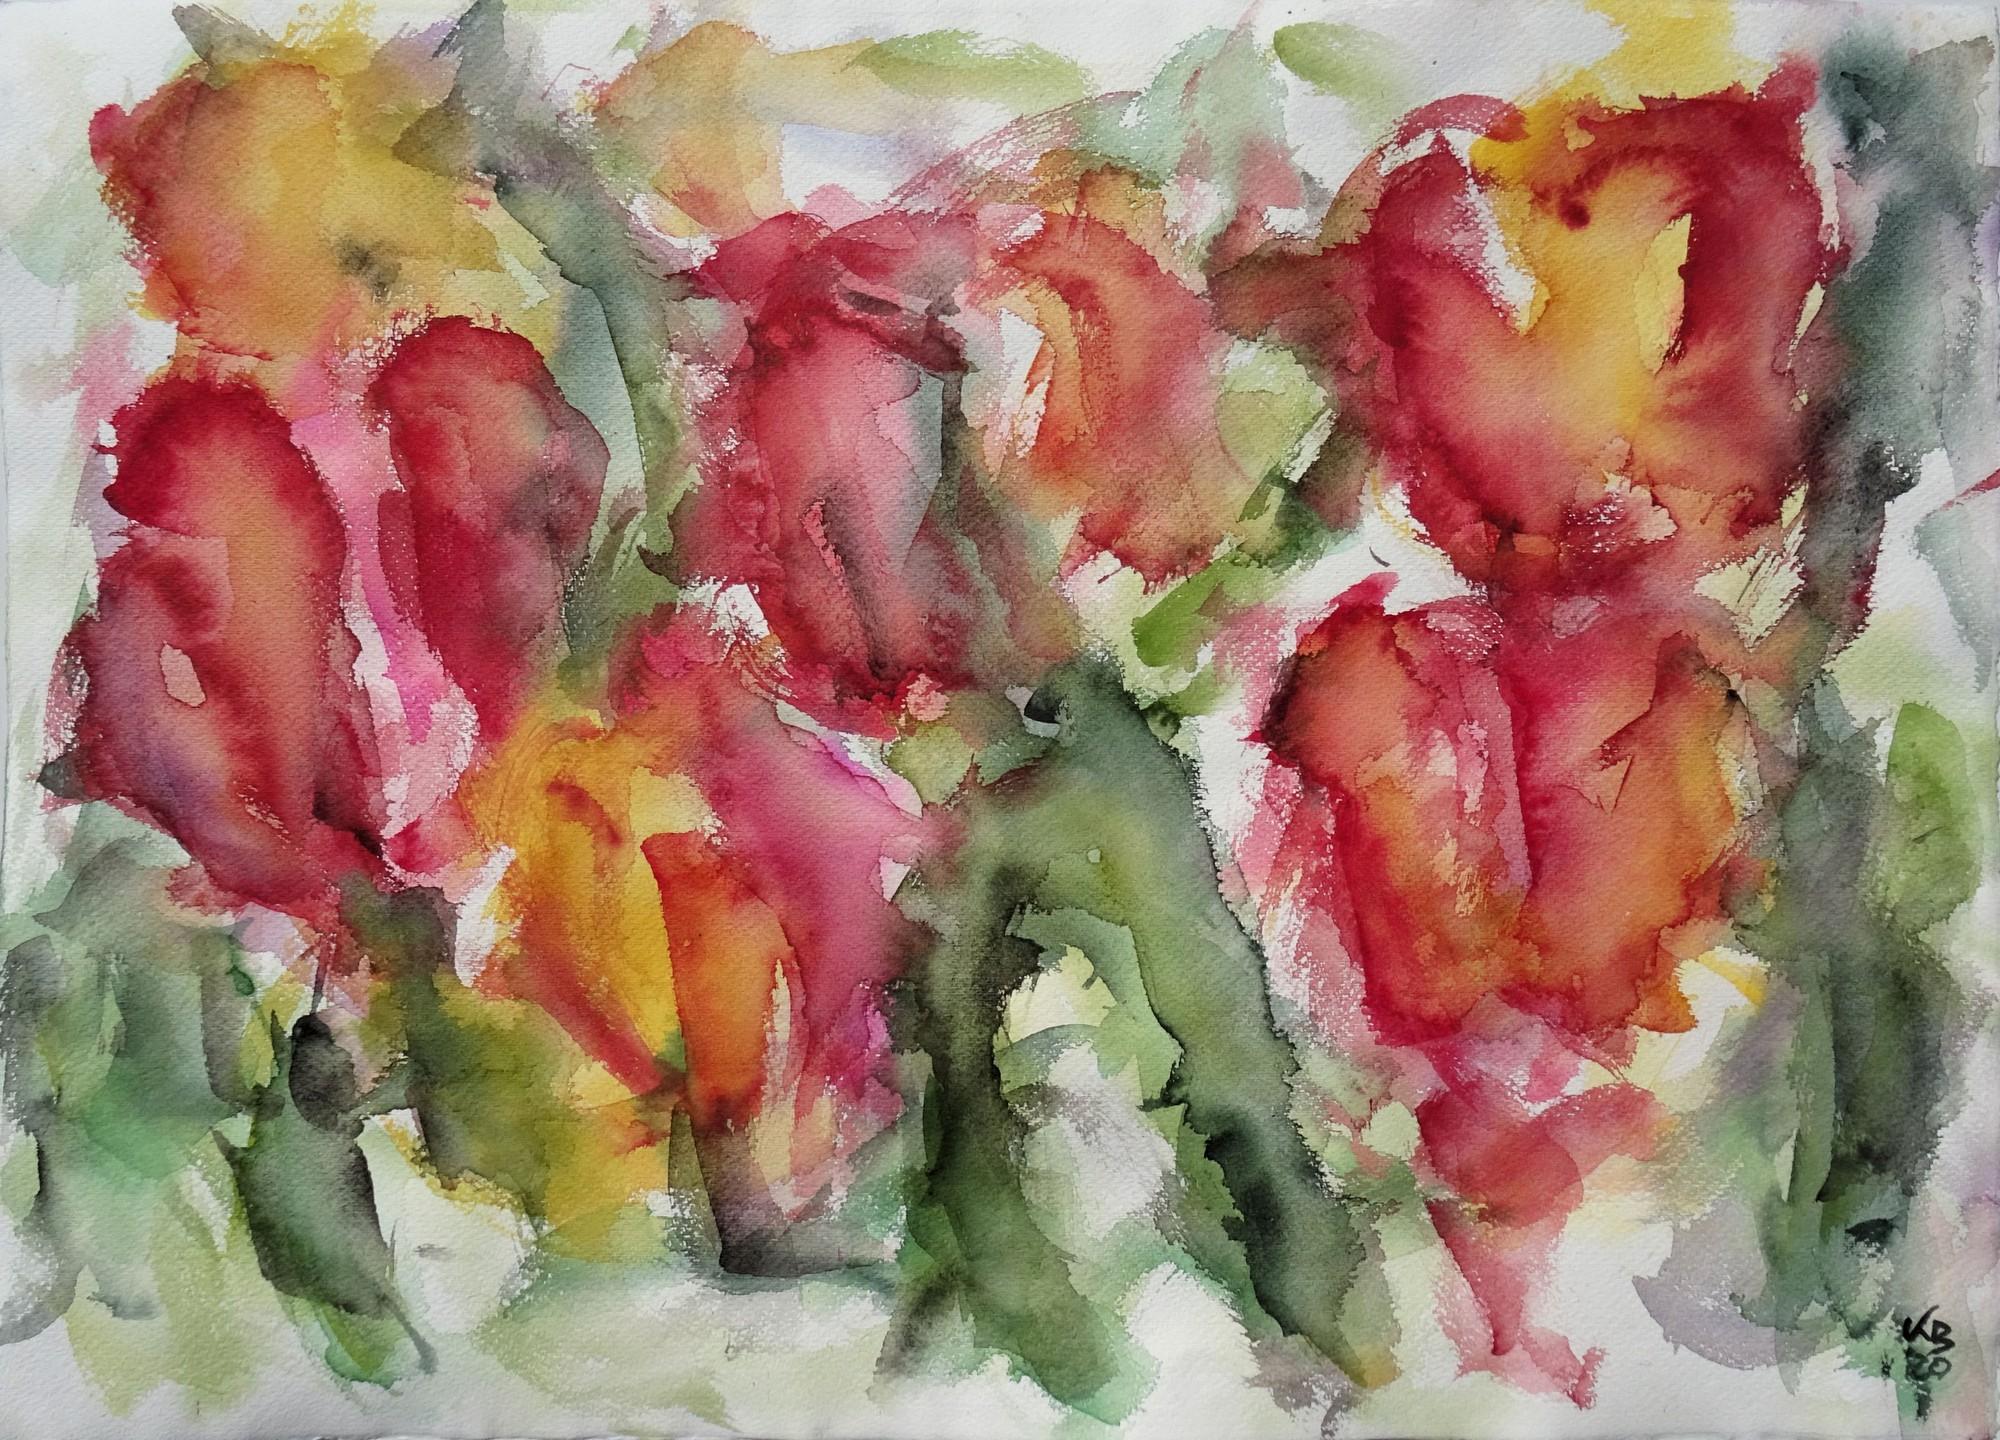 Frühling I, Watercolour 70 x 50 cm, © 2020 by Klaus Bölling